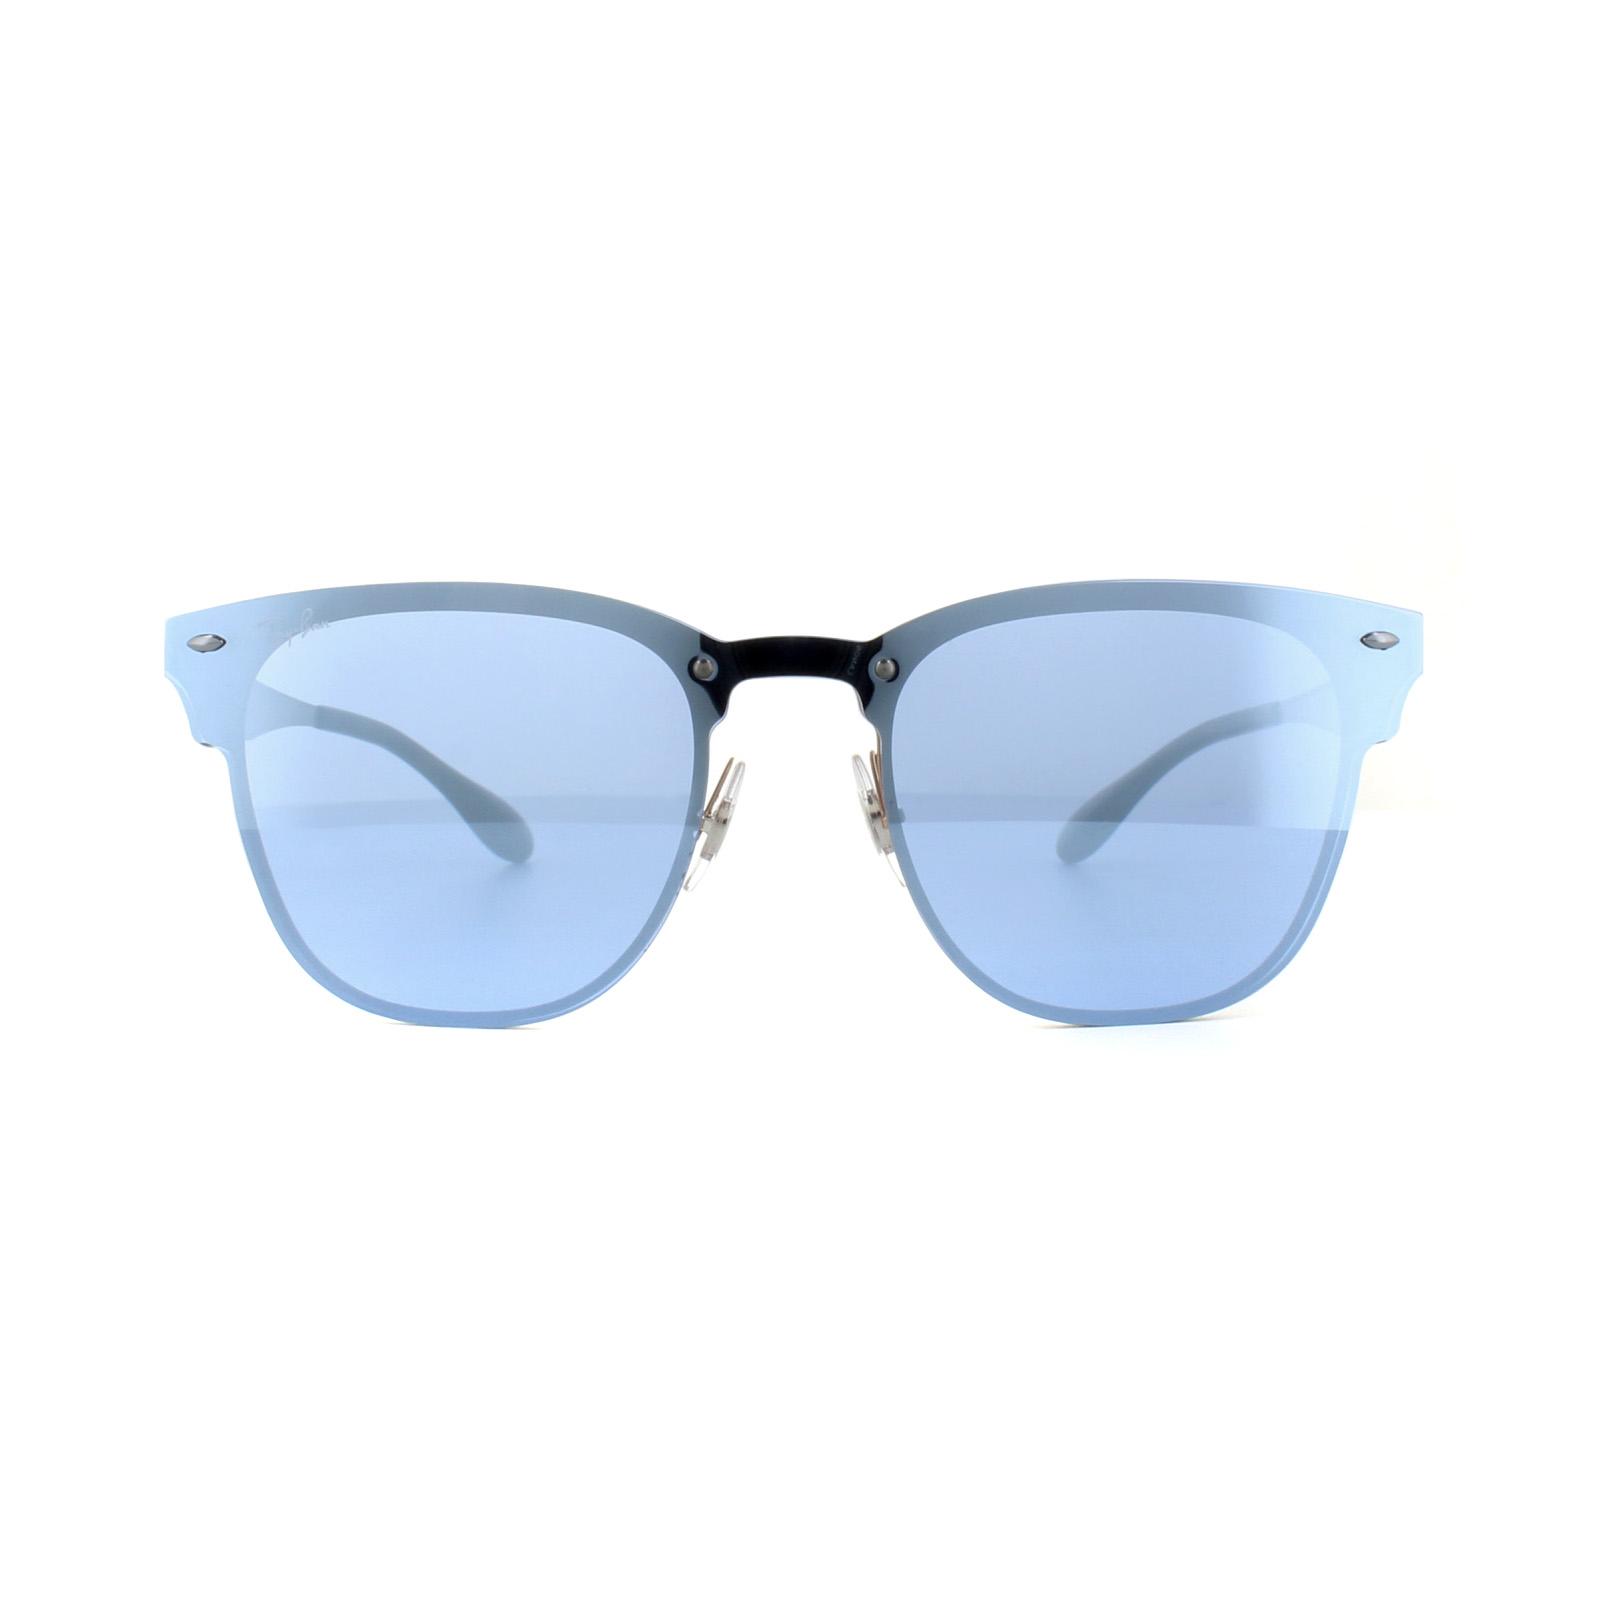 Cheap Ray Ban Blaze Clubmaster 3576n Sunglasses